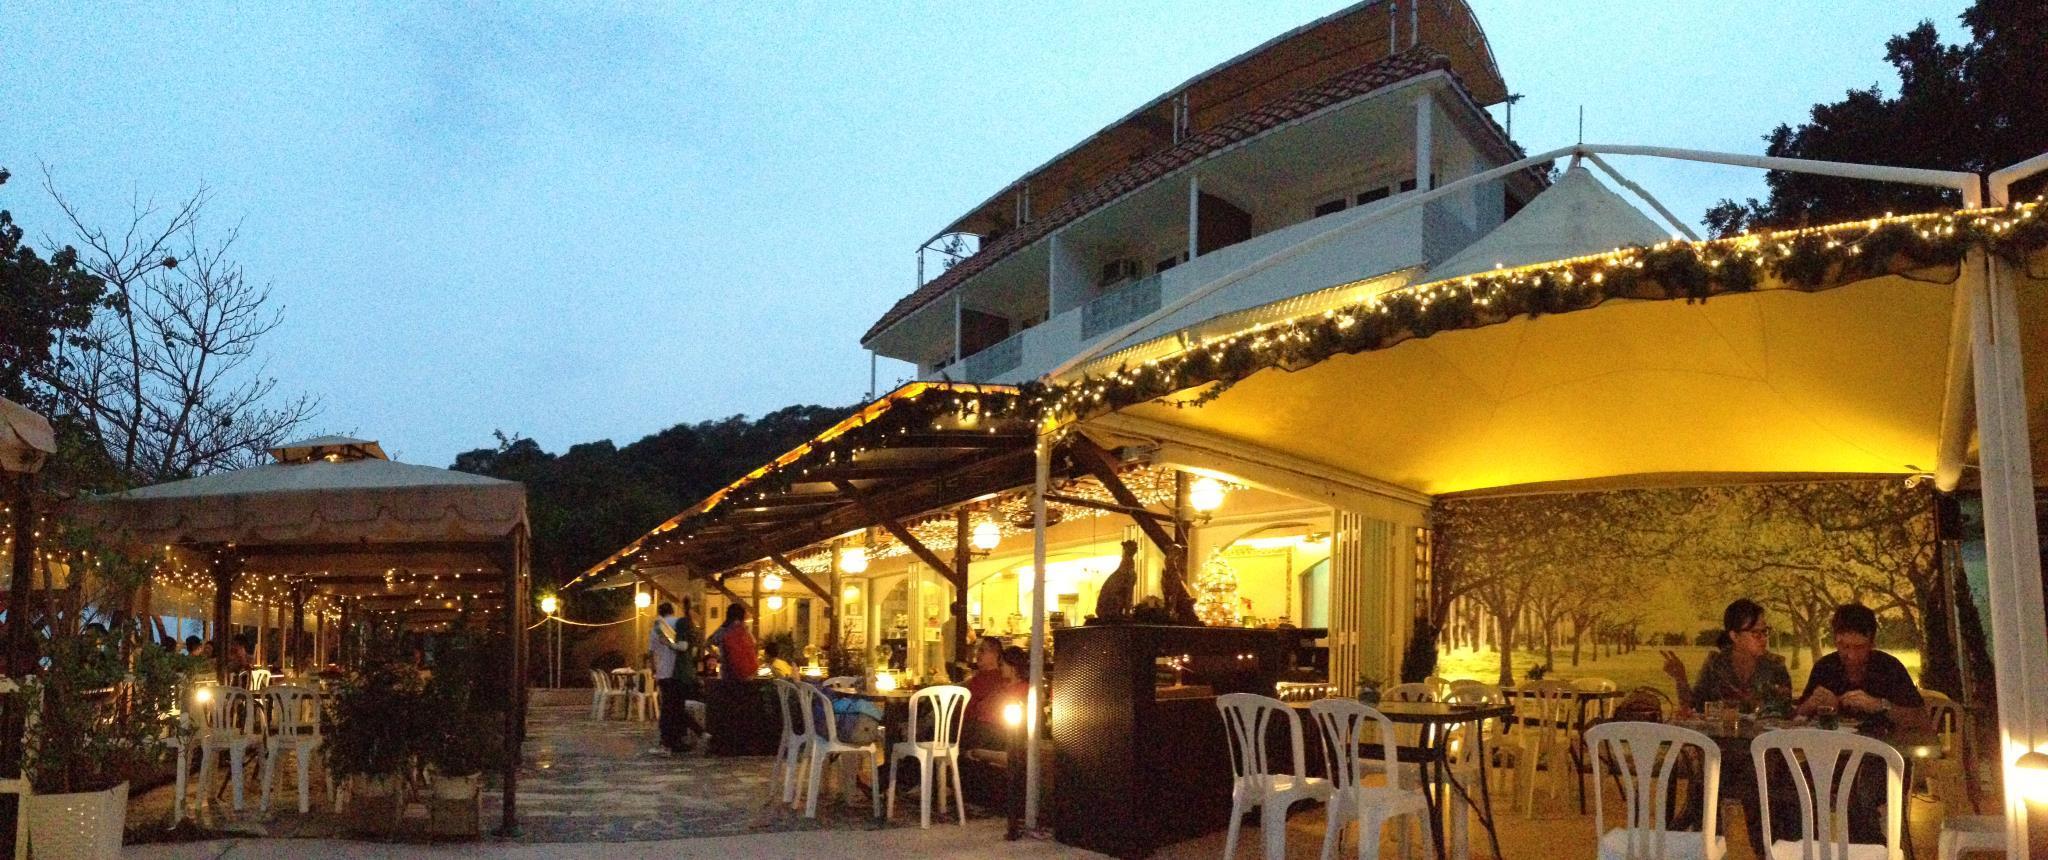 Concerto Inn - Superior Room S1, Lantau Islands